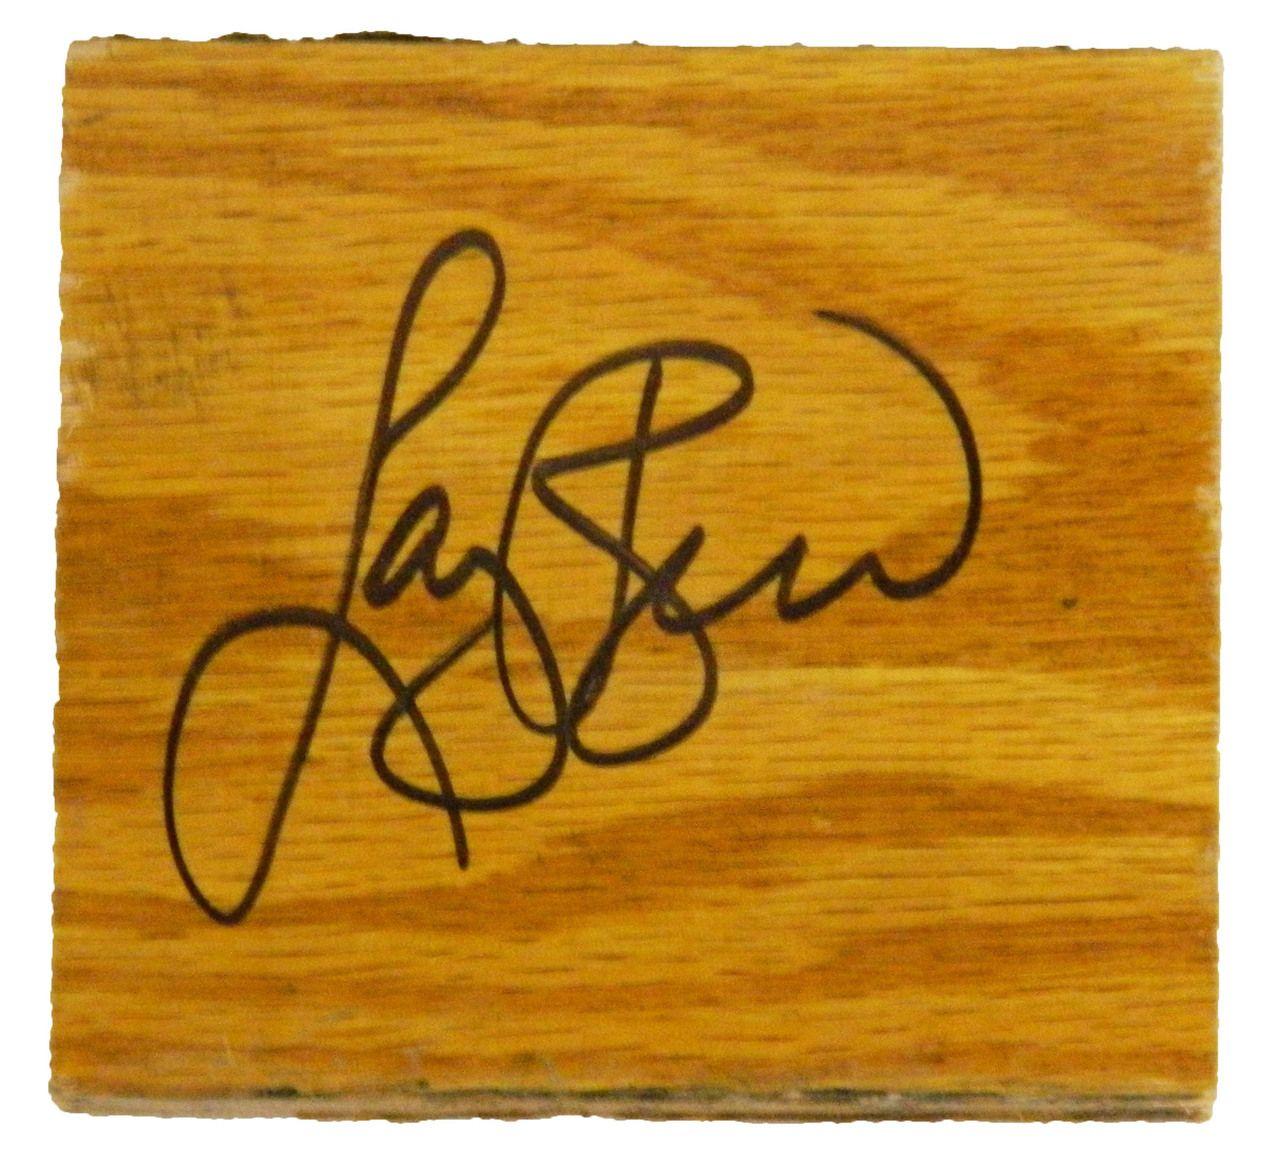 Aaa Sports Memorabilia Llc Larrybird Signed Celtics Bostongarden Original Parquetfloor 4x4 Piece Birflo200 272 95 Ht Larry Bird Boston Garden Celtic